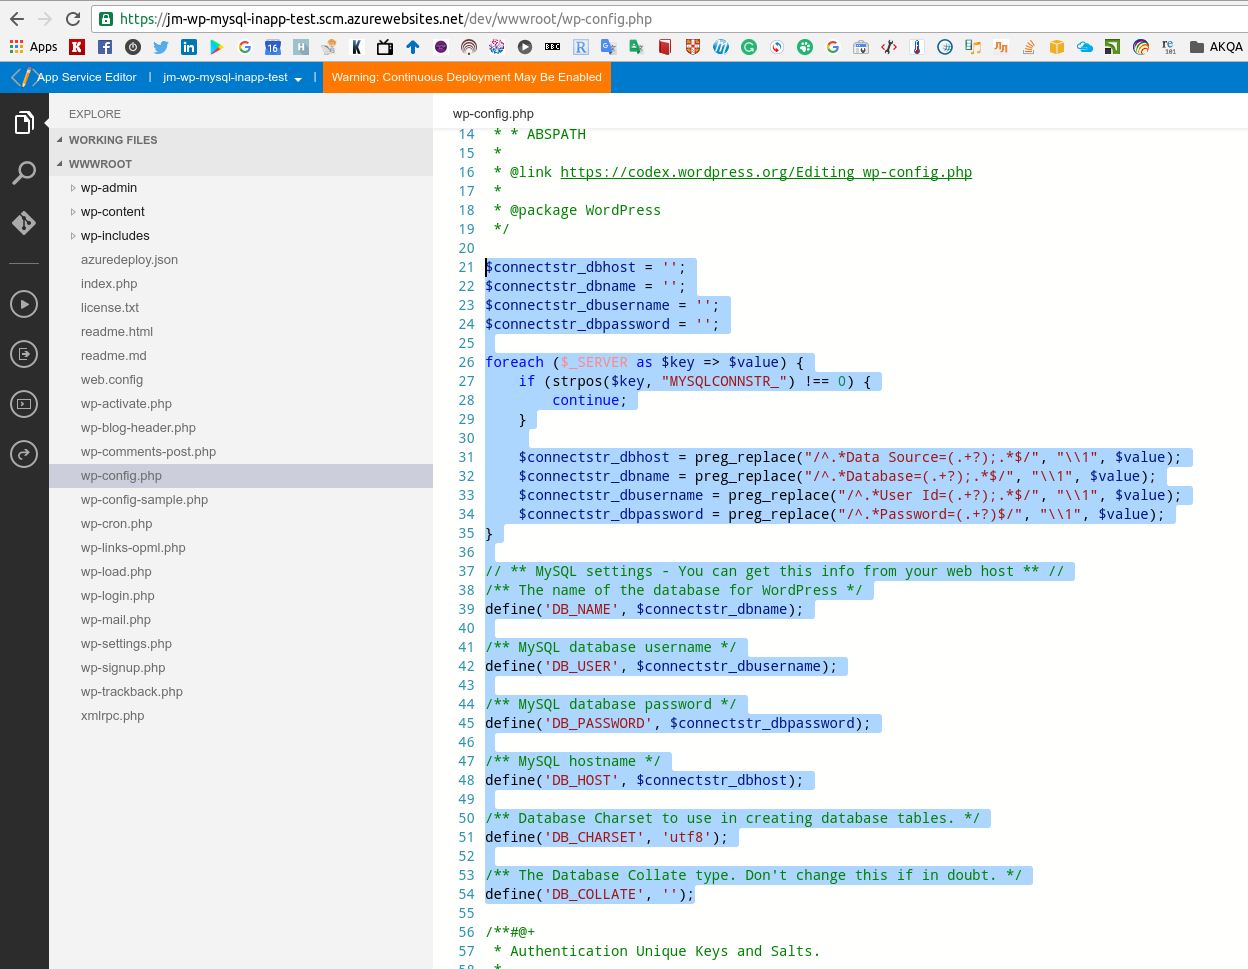 Azure: настройка MySQL in-app (Preview) для Web Apps и сравнение с